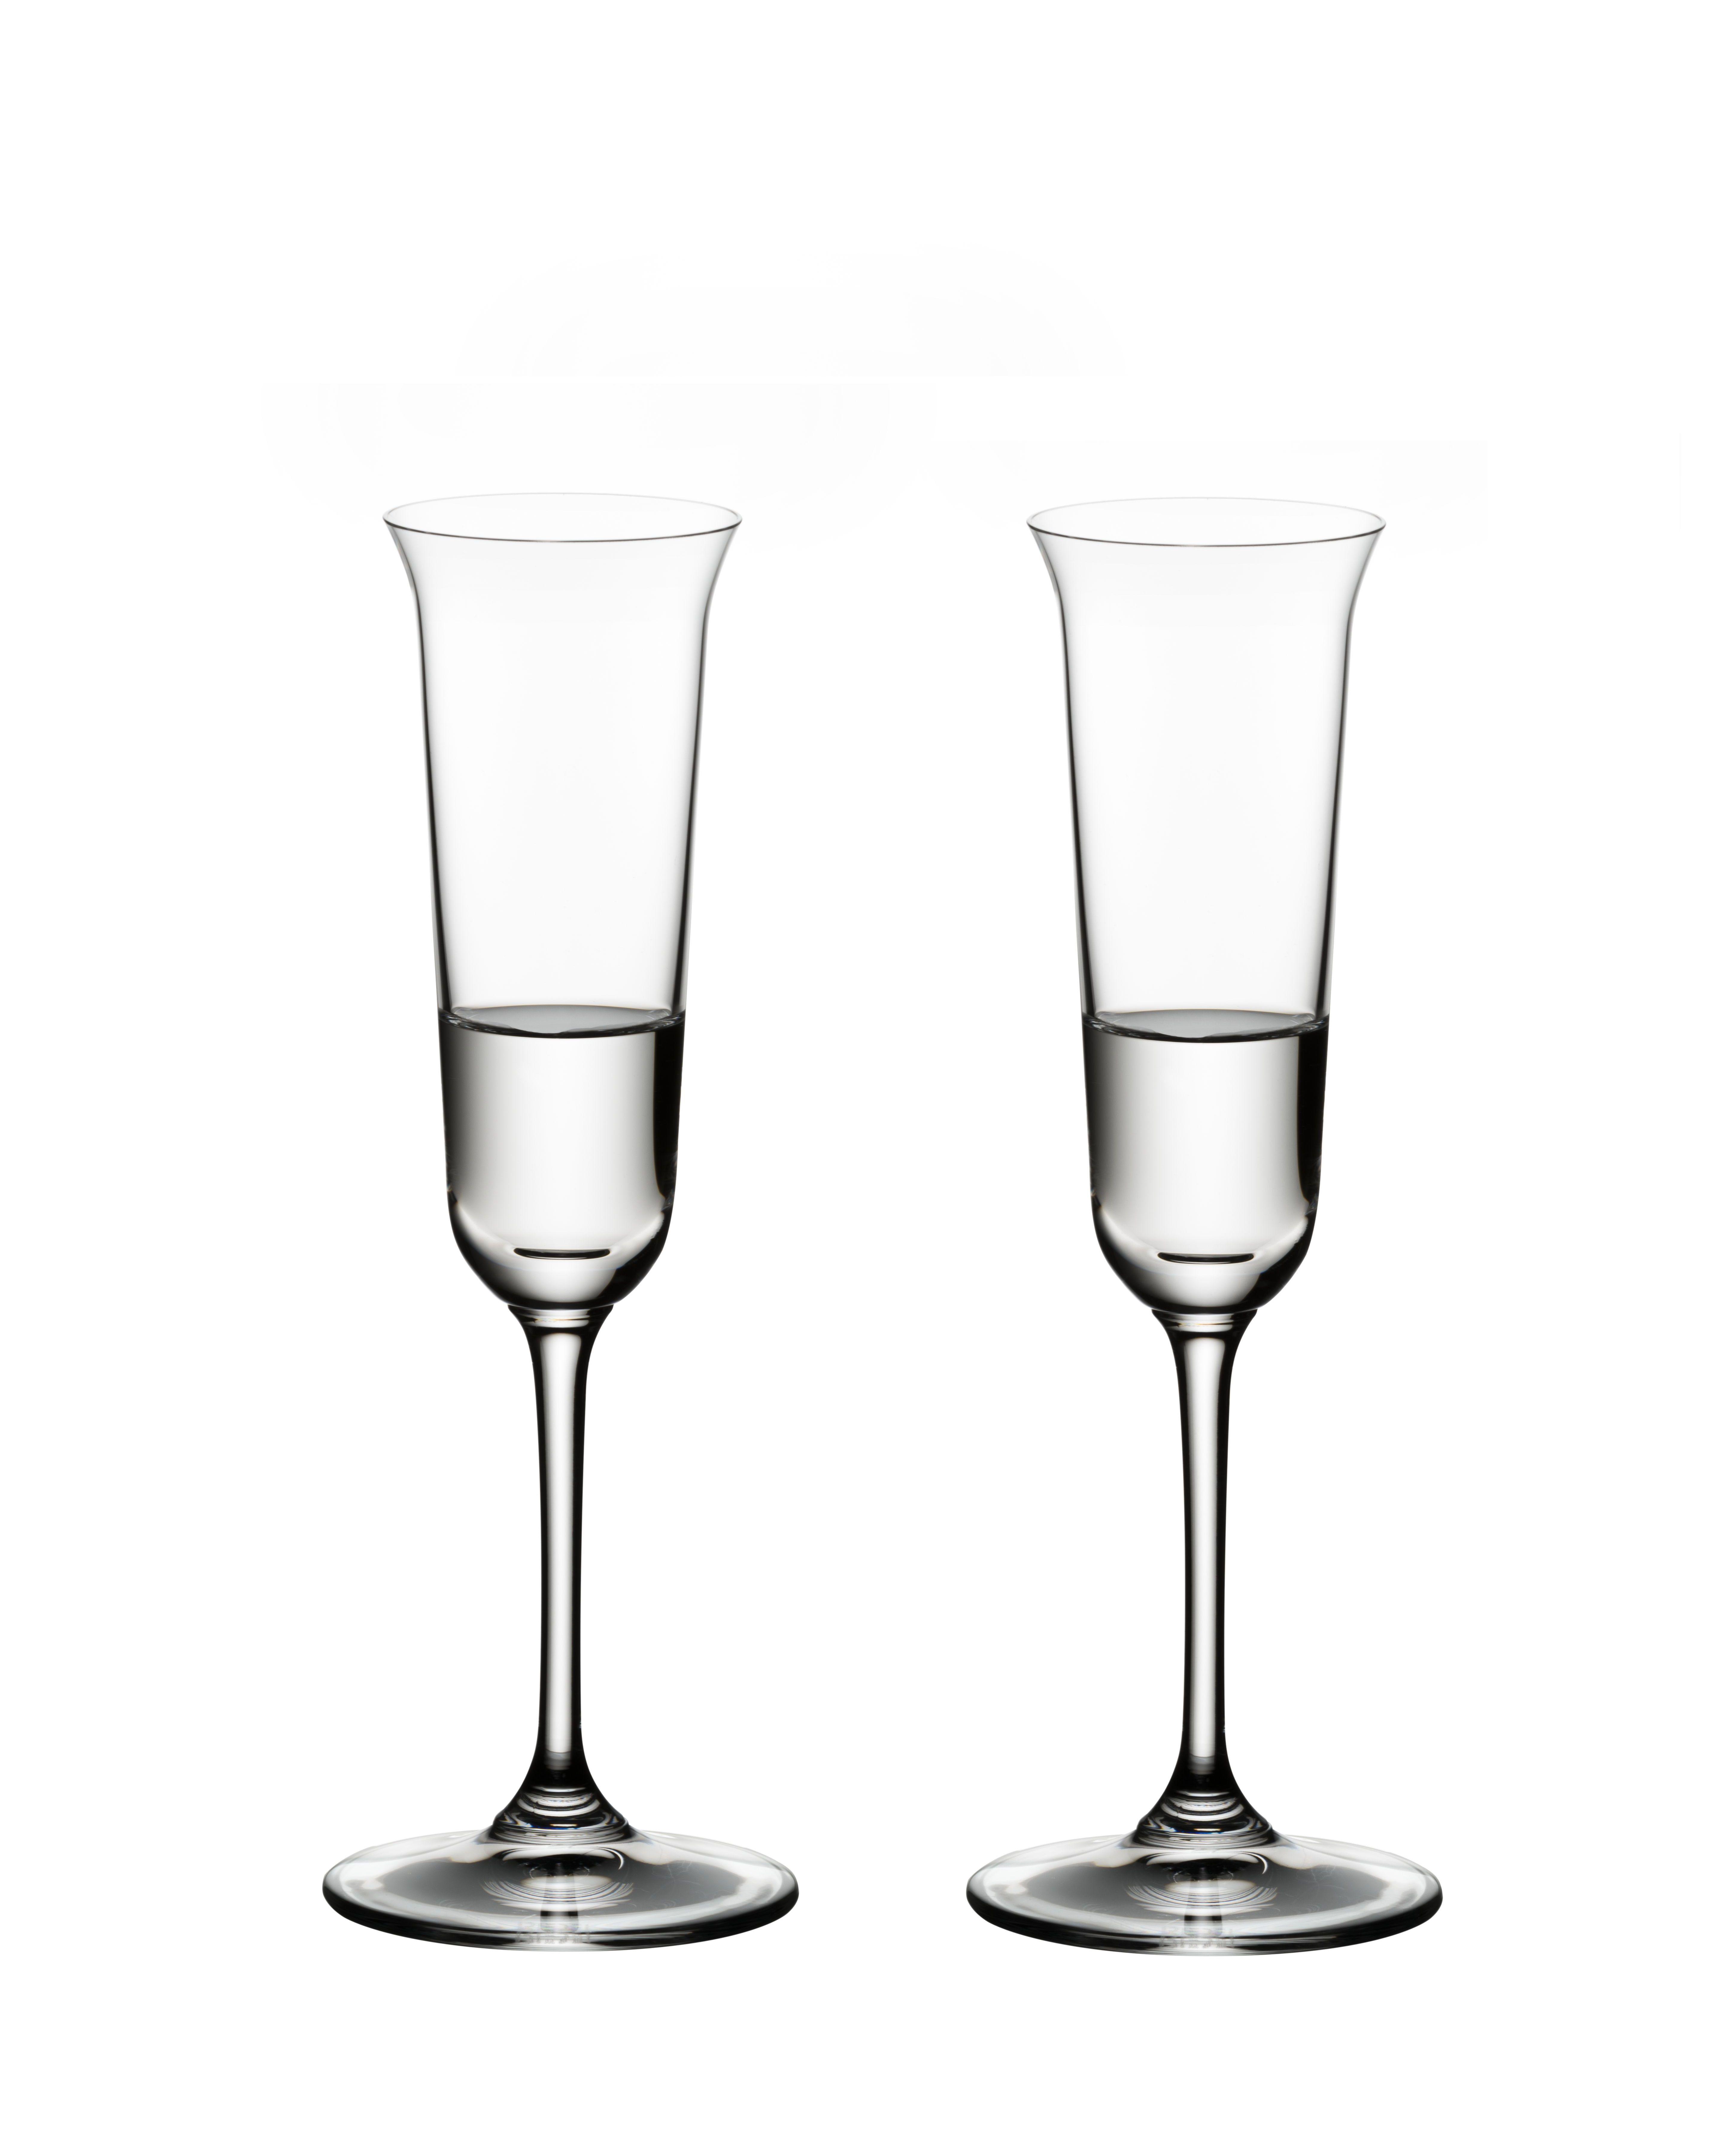 Riedel Grappaglas Vinum - 2 Stuks